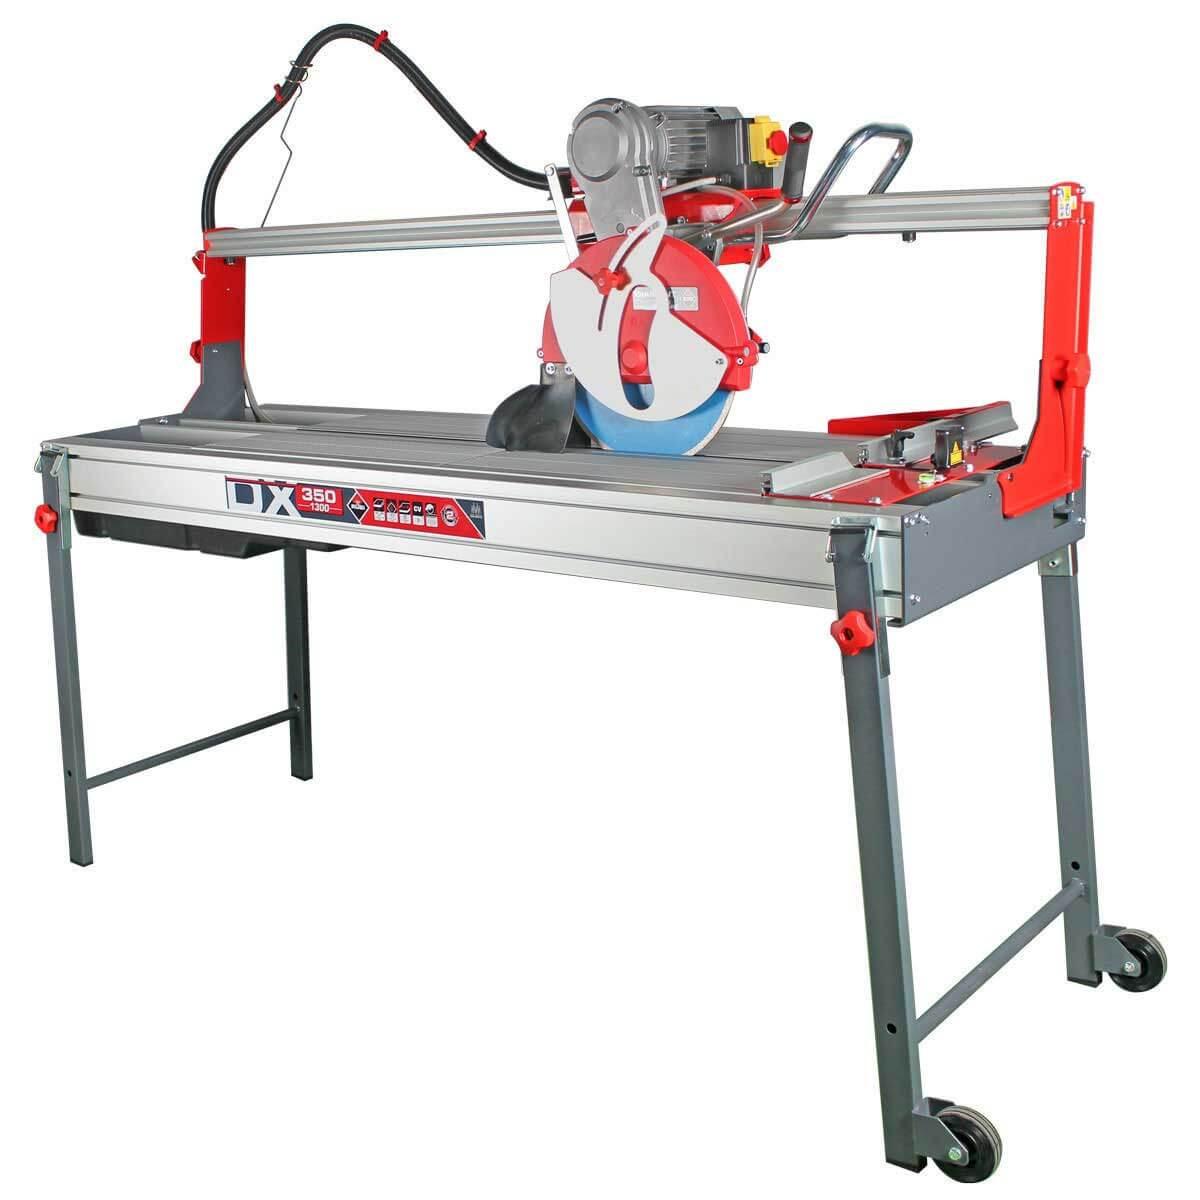 Rubi DX-350-N 1300 Tile Saw with Laser & Level